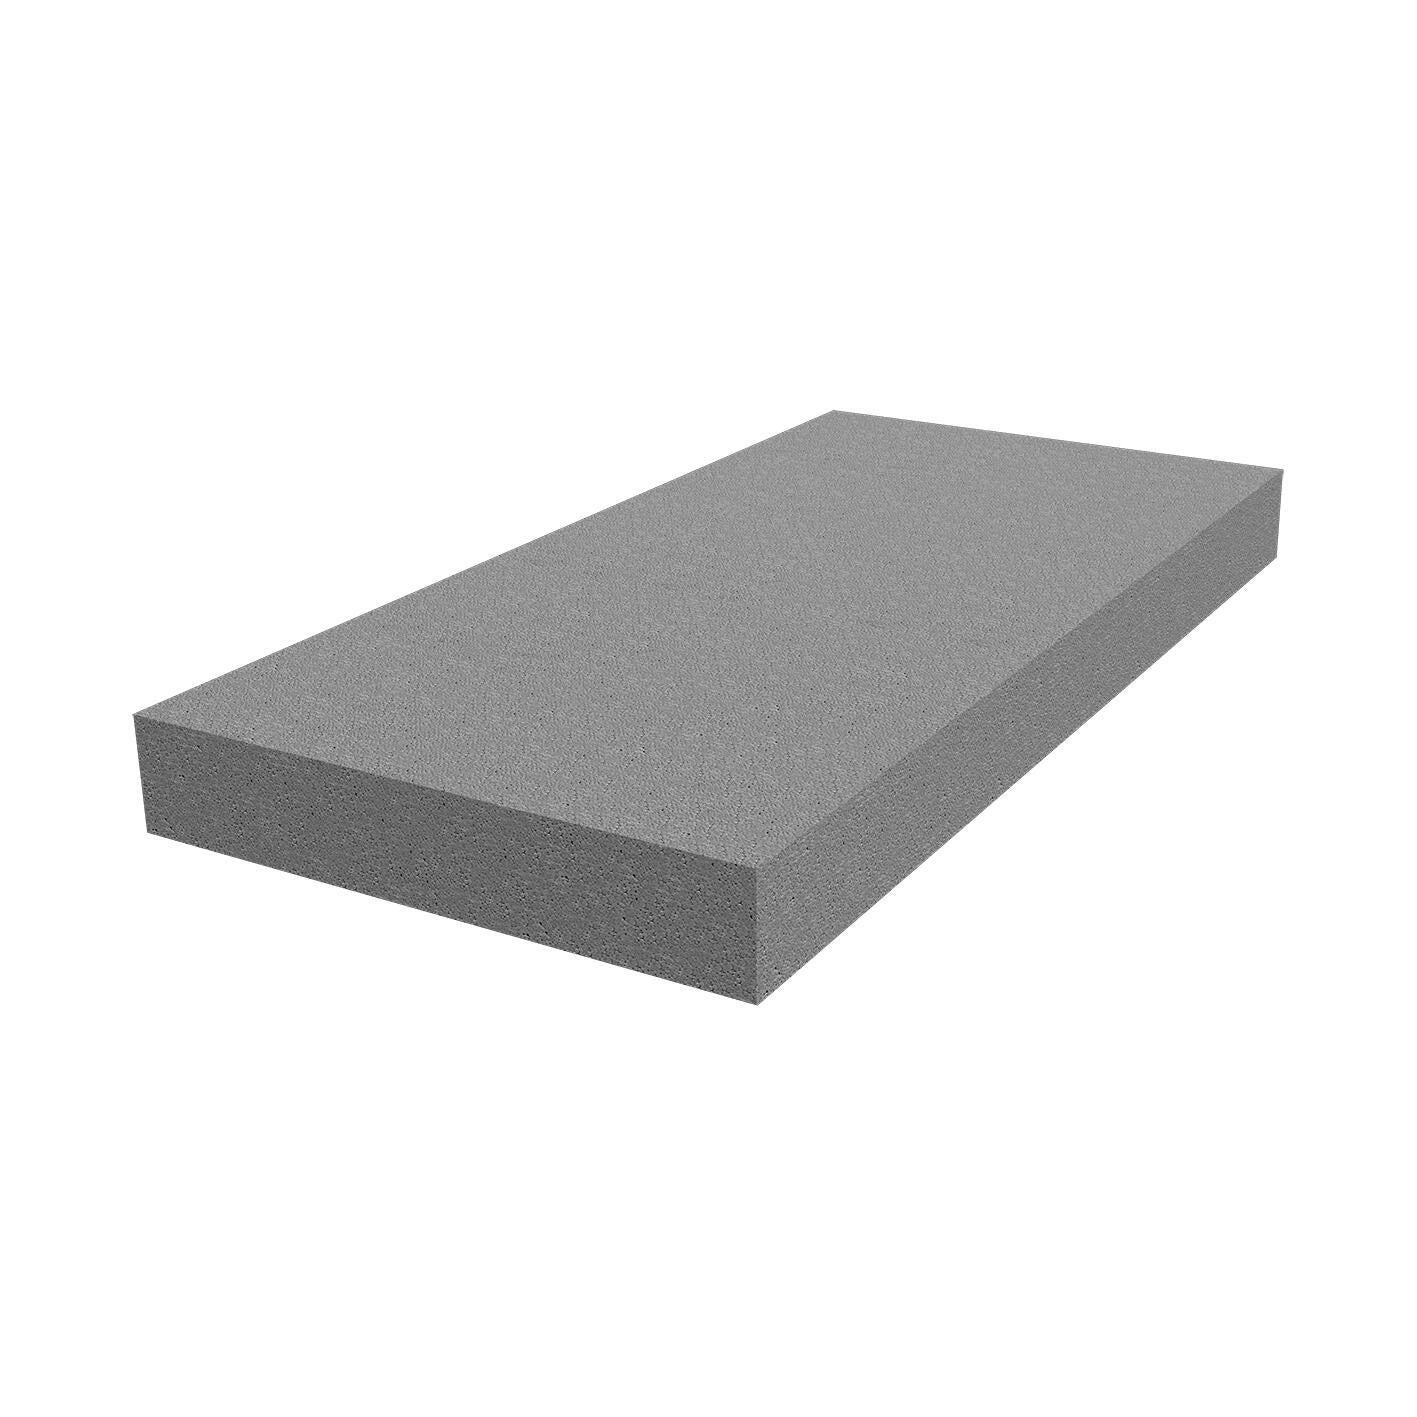 Pannello isolante EPS Grafite 0.5 x 1 m Sp 100 mm - 1